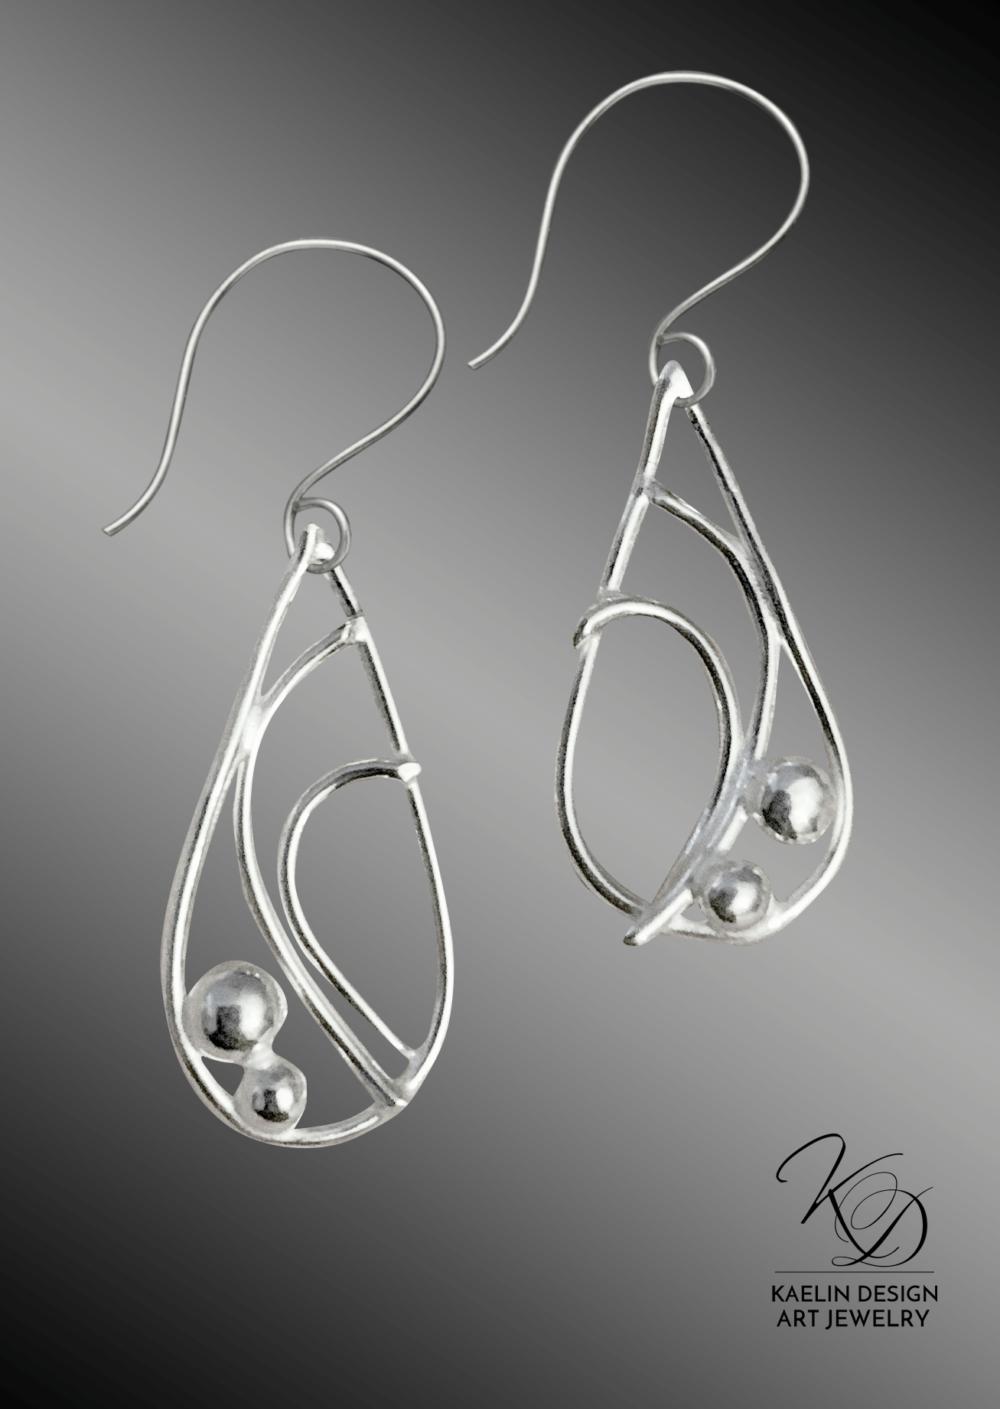 Delicate Tides Sterling Silver Earrings by Kaelin Design